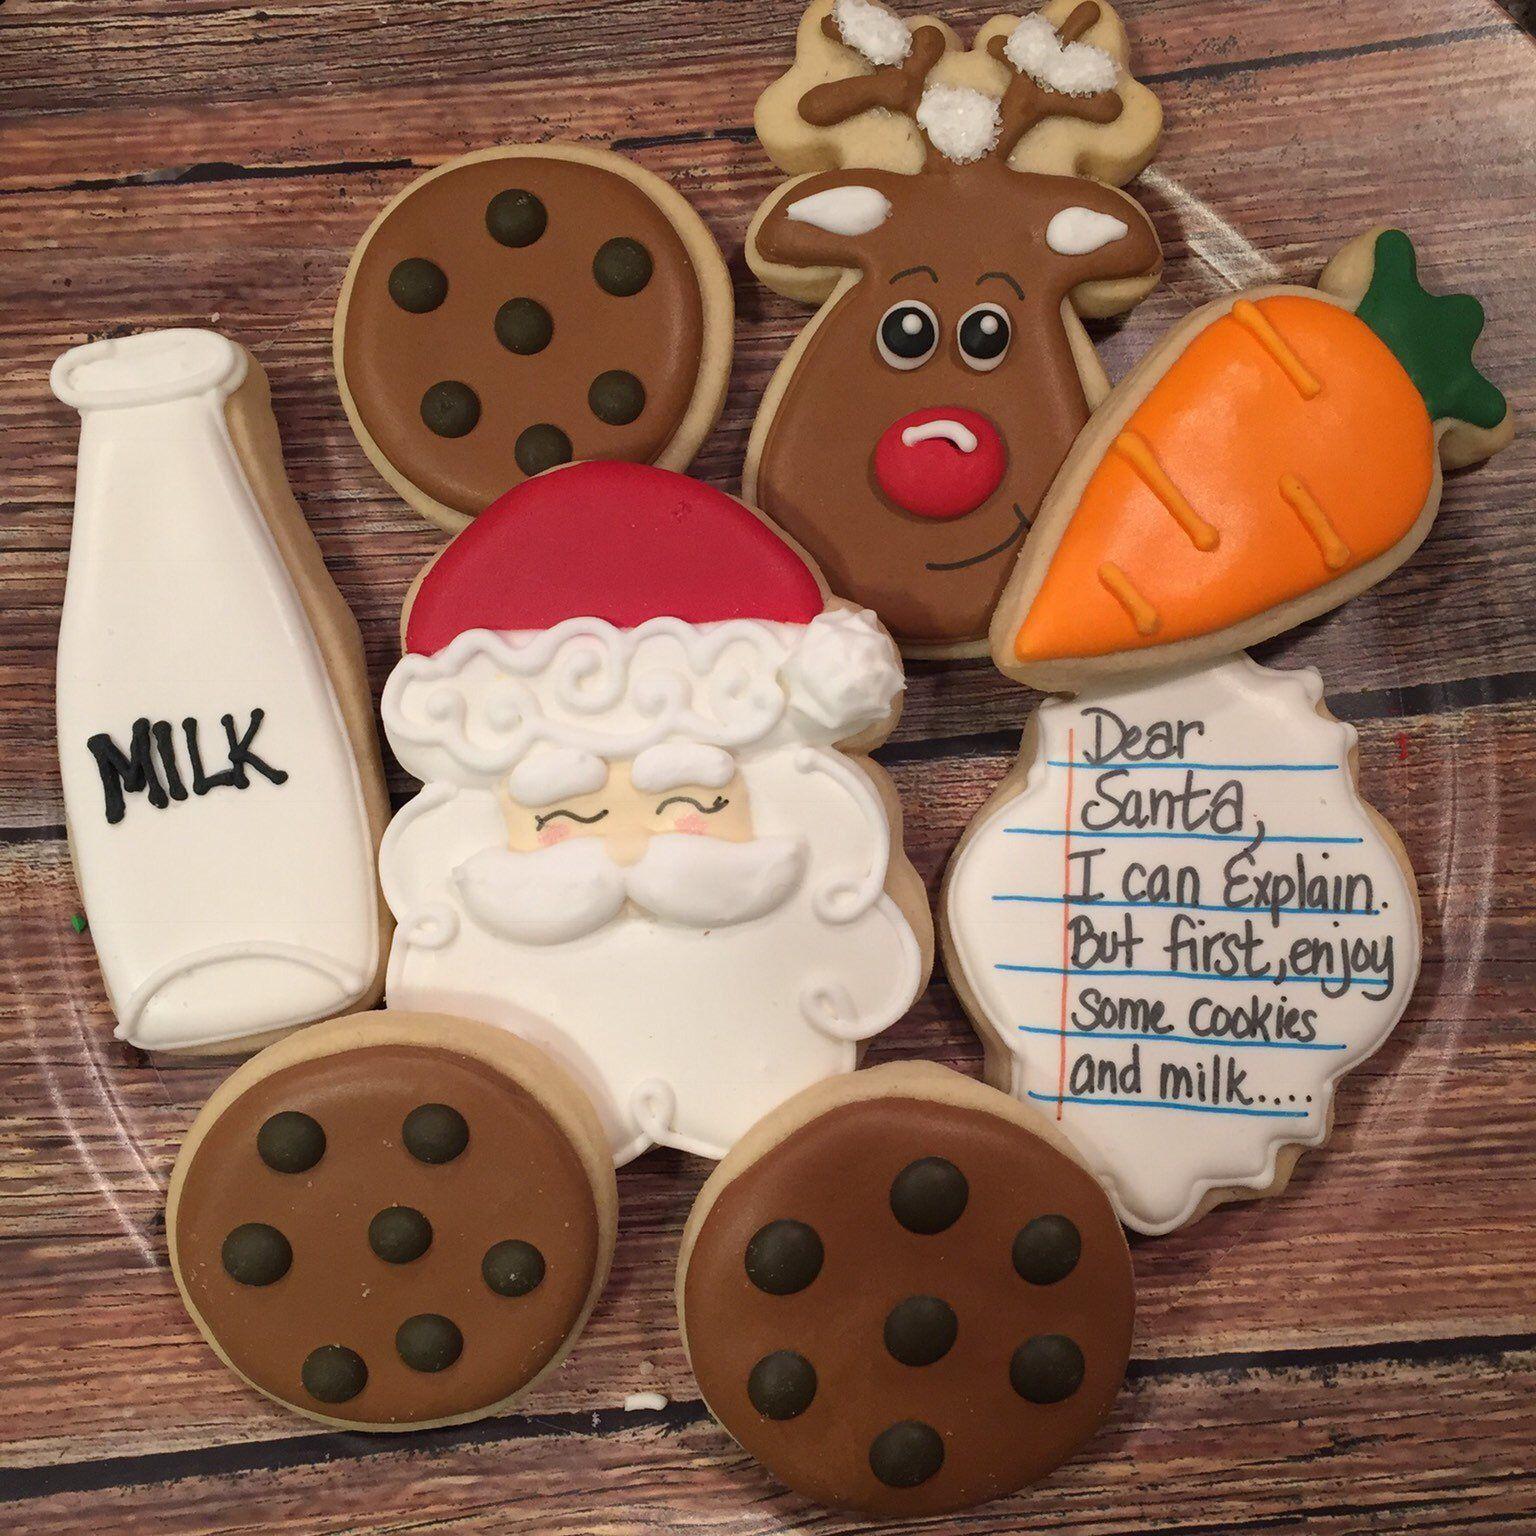 Cookies for Santa Sugar Cookies/ Decorated Christmas Sugar Cookies #christmassugarcookies